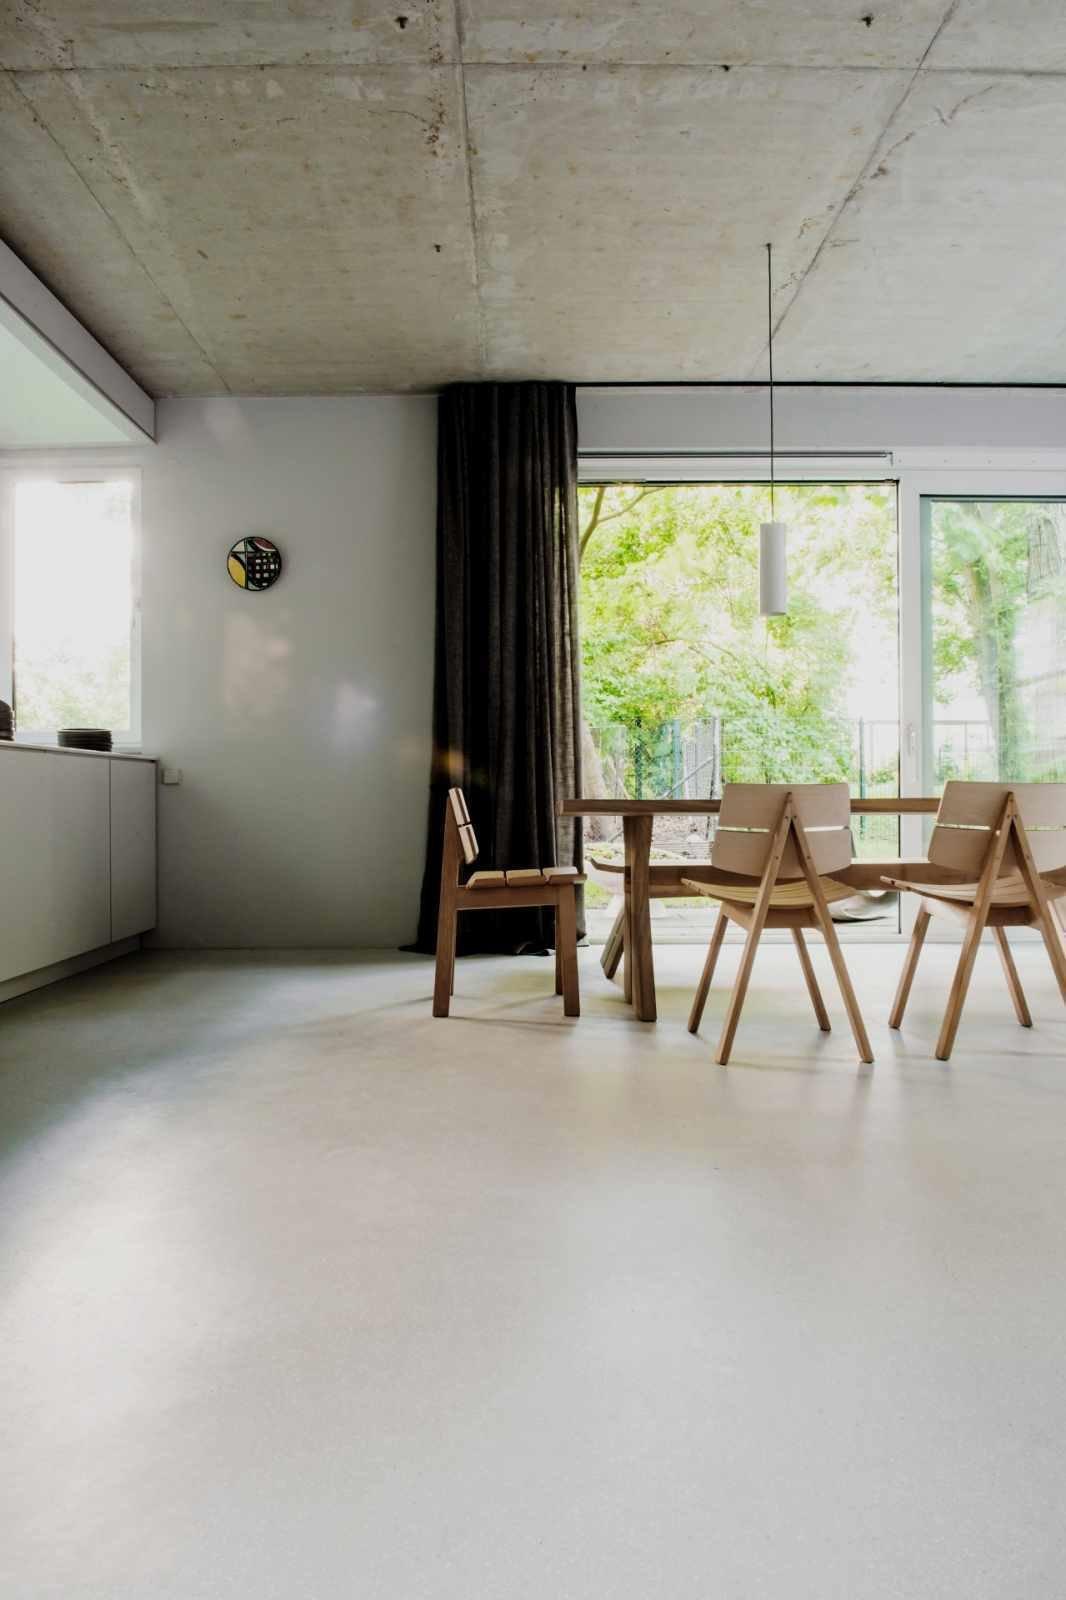 House on Prenzlauer Berg by Leibal